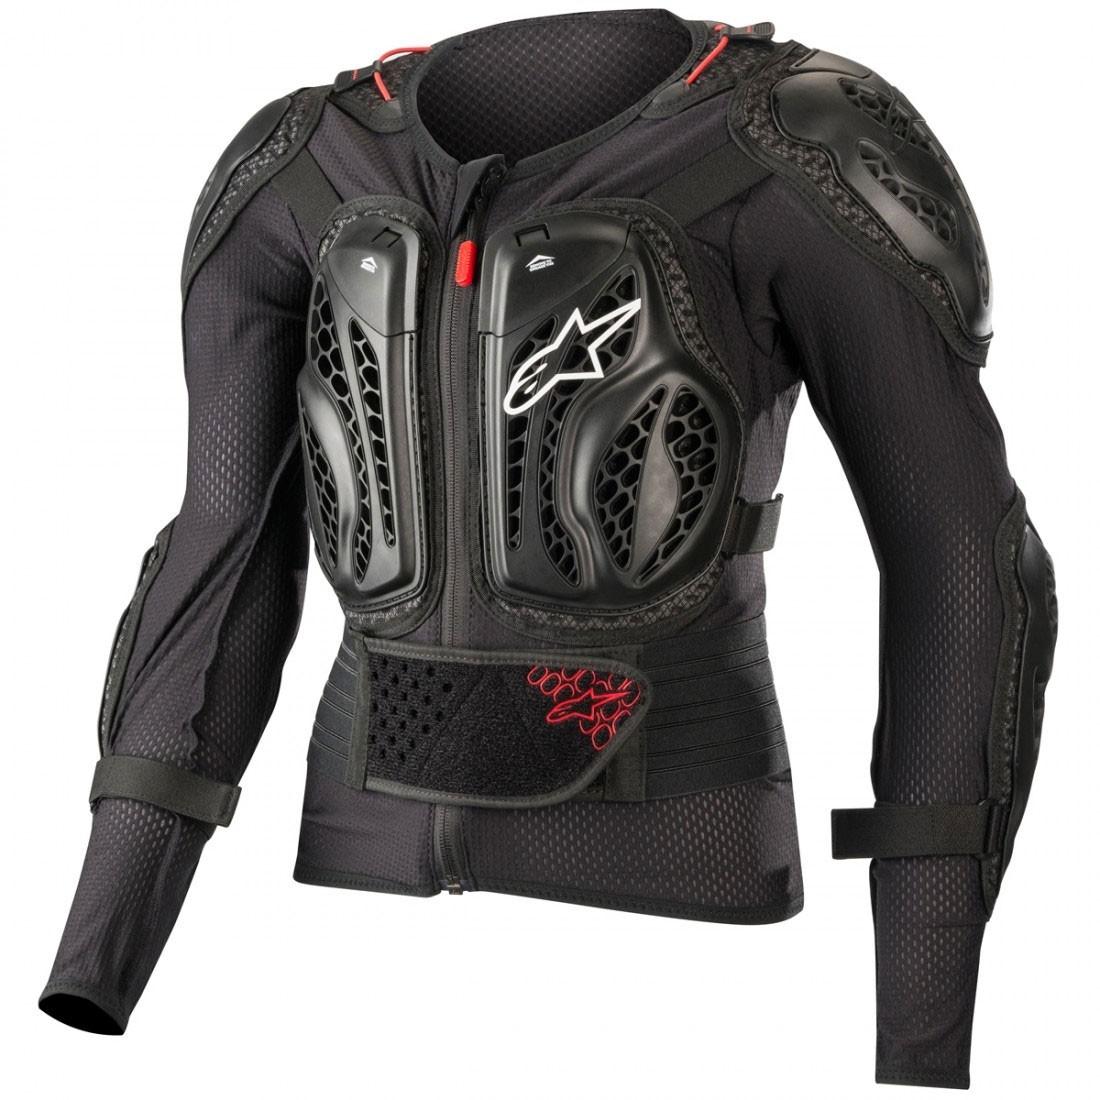 6788701dca7 Proteccion ALPINESTARS Bionic Action Black / Red · Motocard